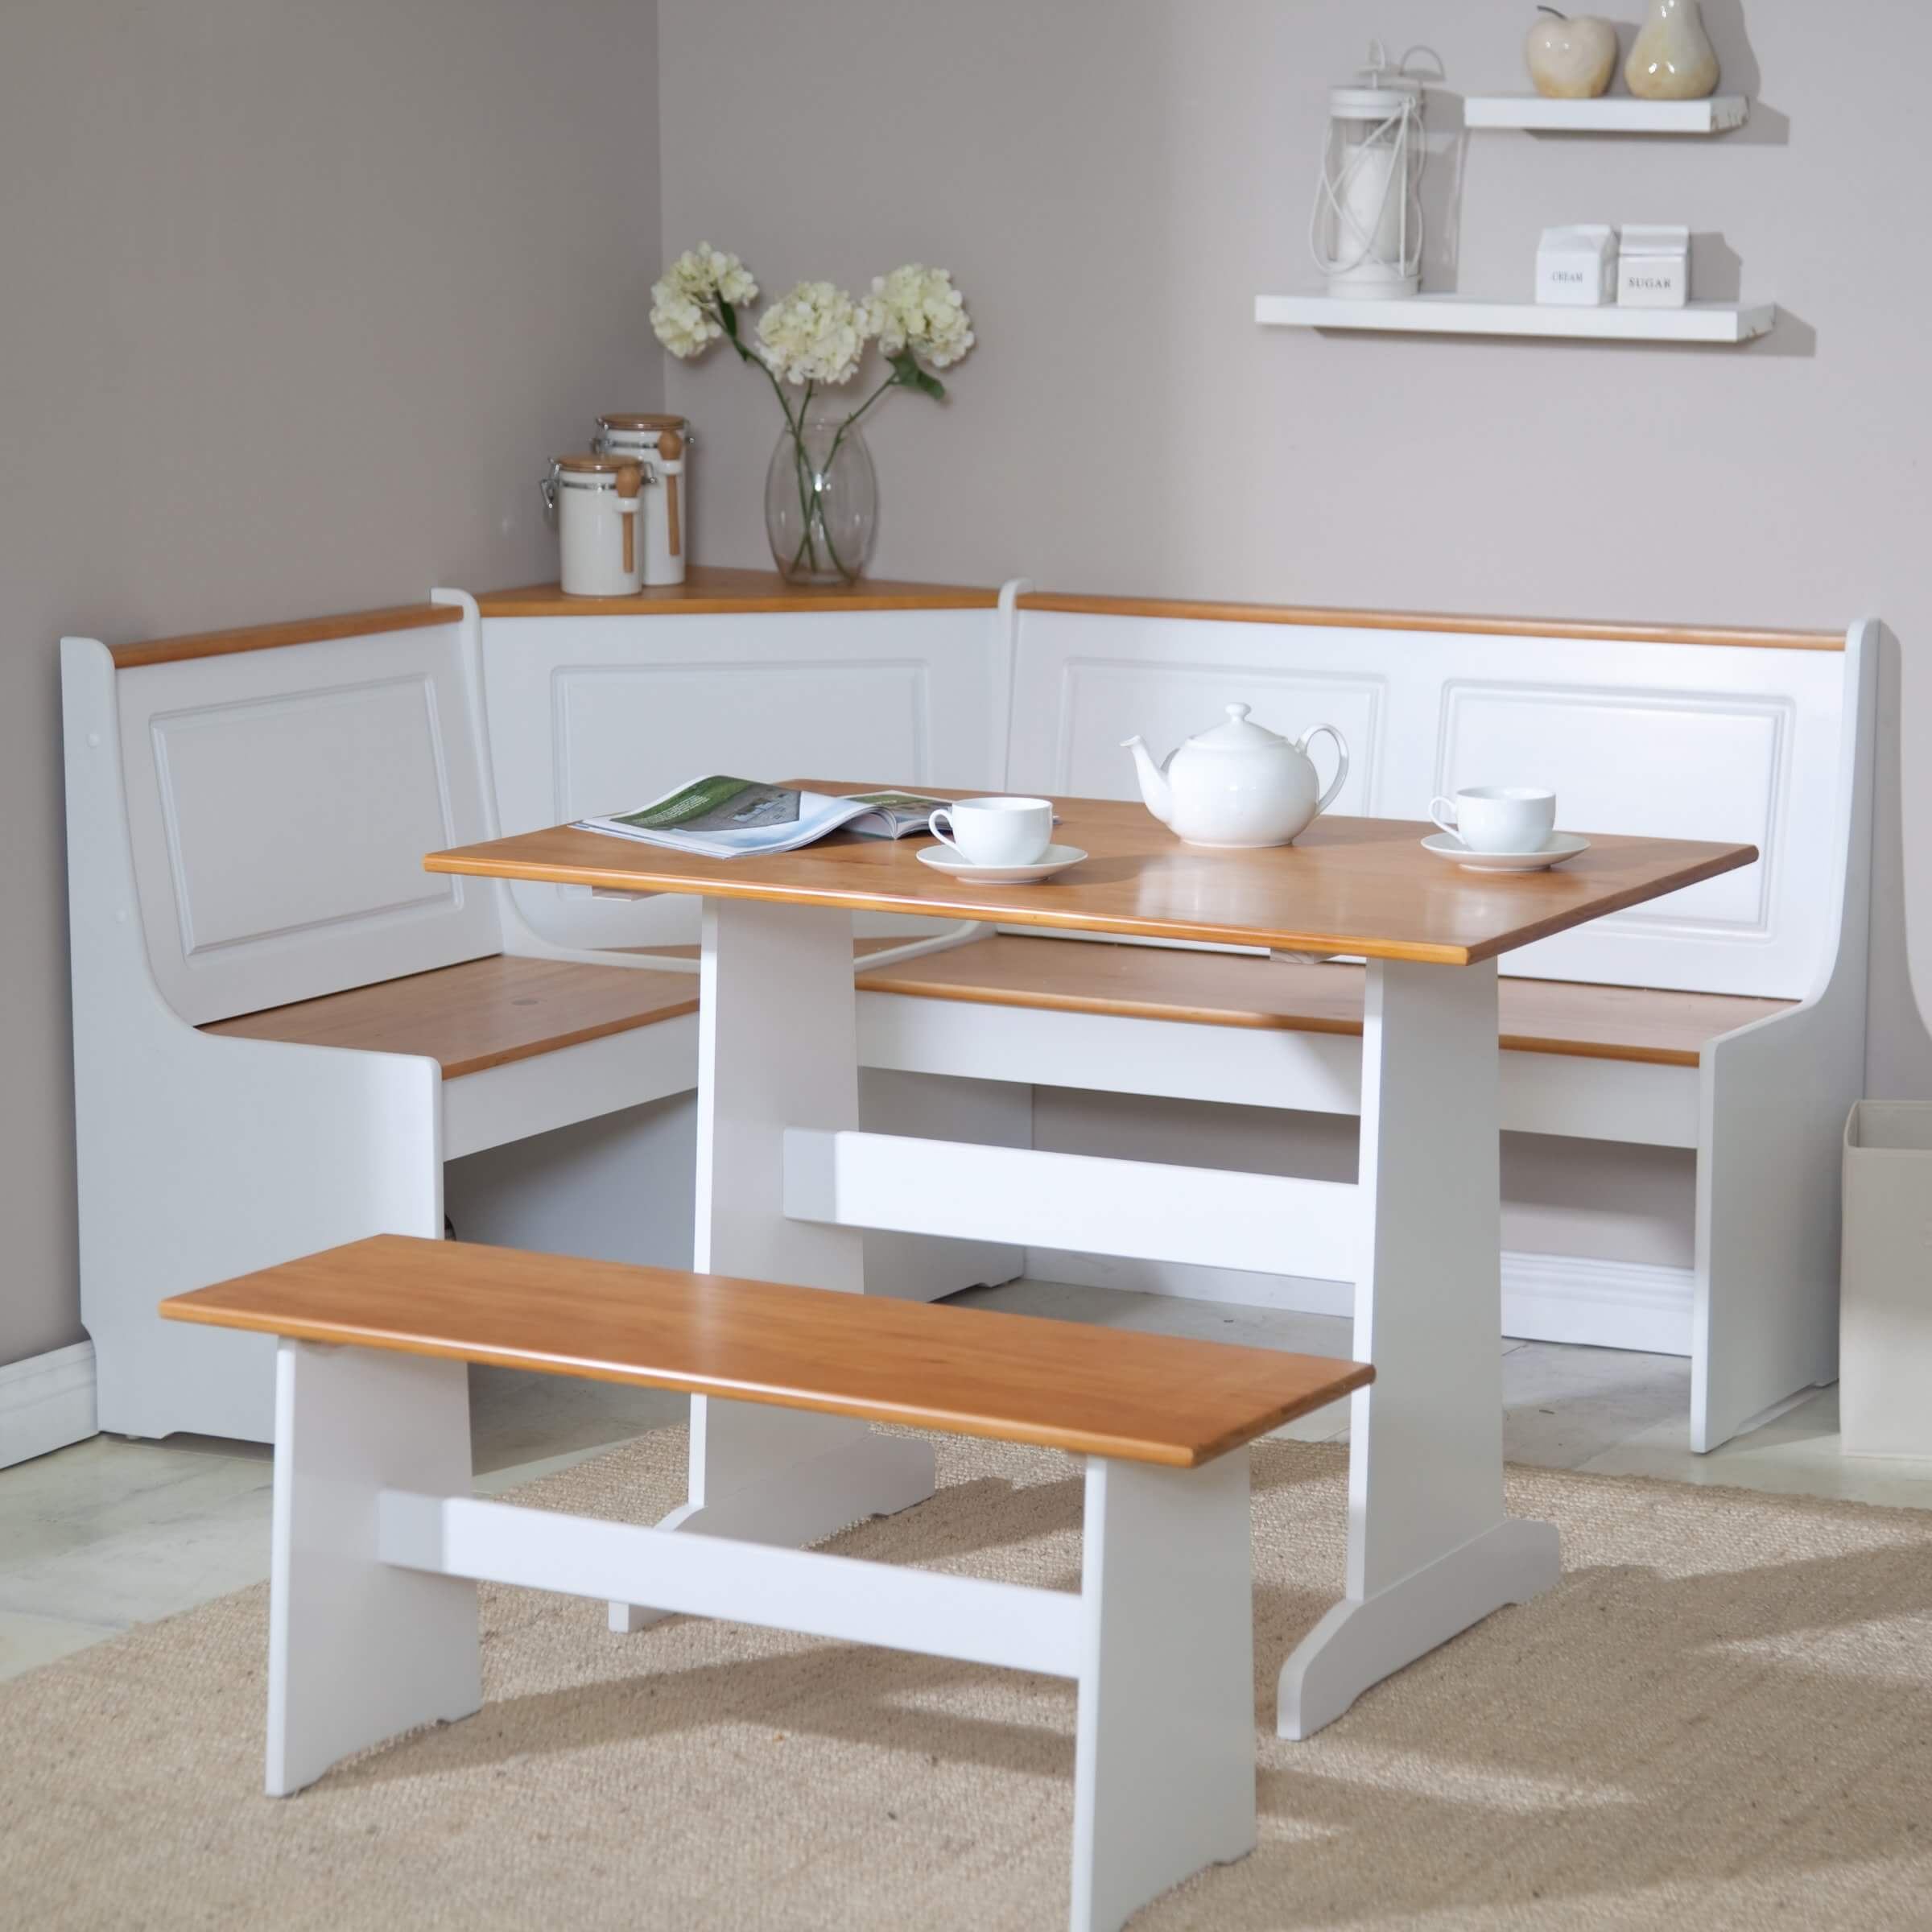 breakfast nook furniture sets kitchen table chairs Ardmore Breakfast Nook Set